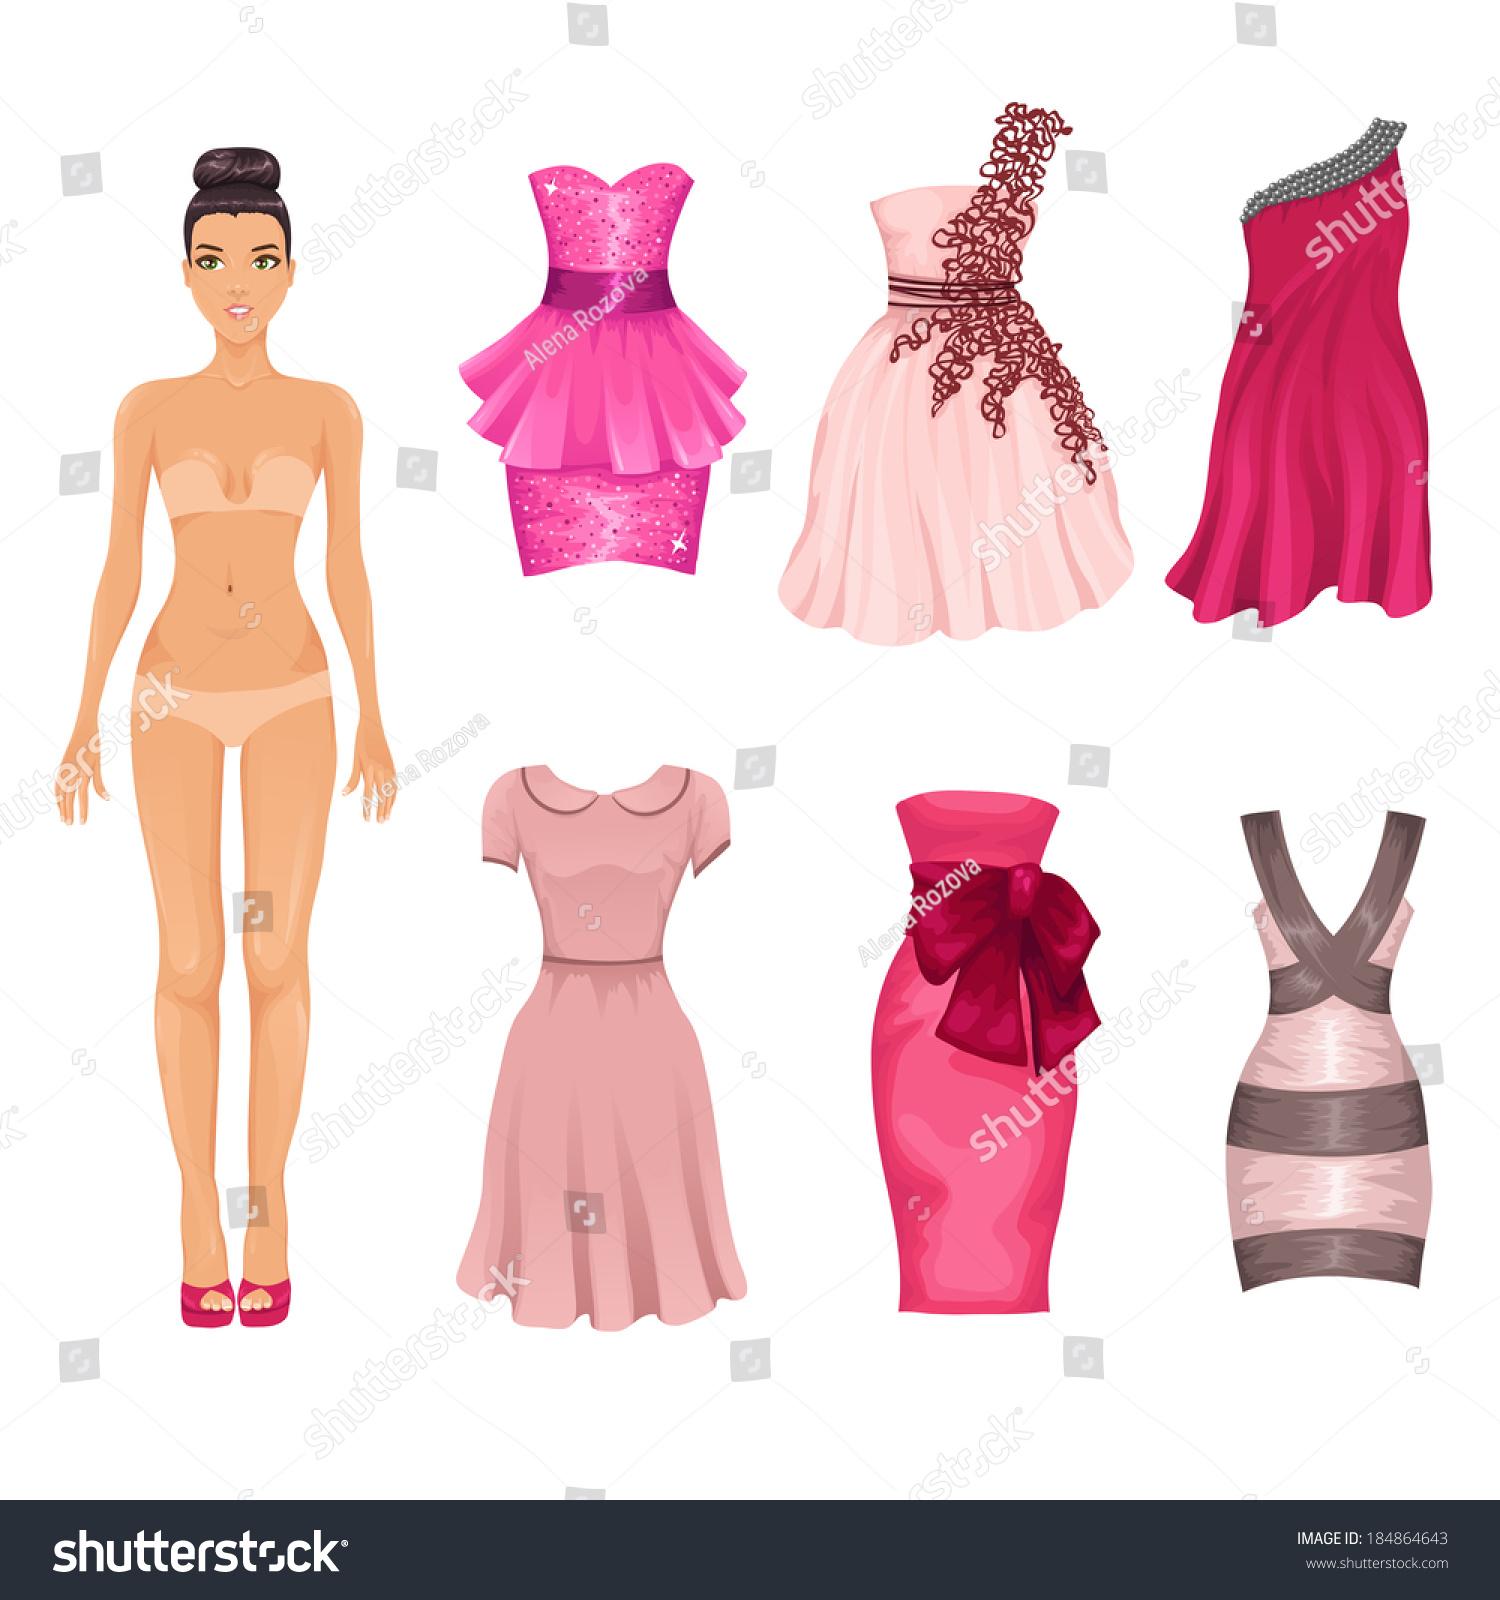 Vector Dressup Doll Assortment Pink Prom Vector de stock184864643 ...